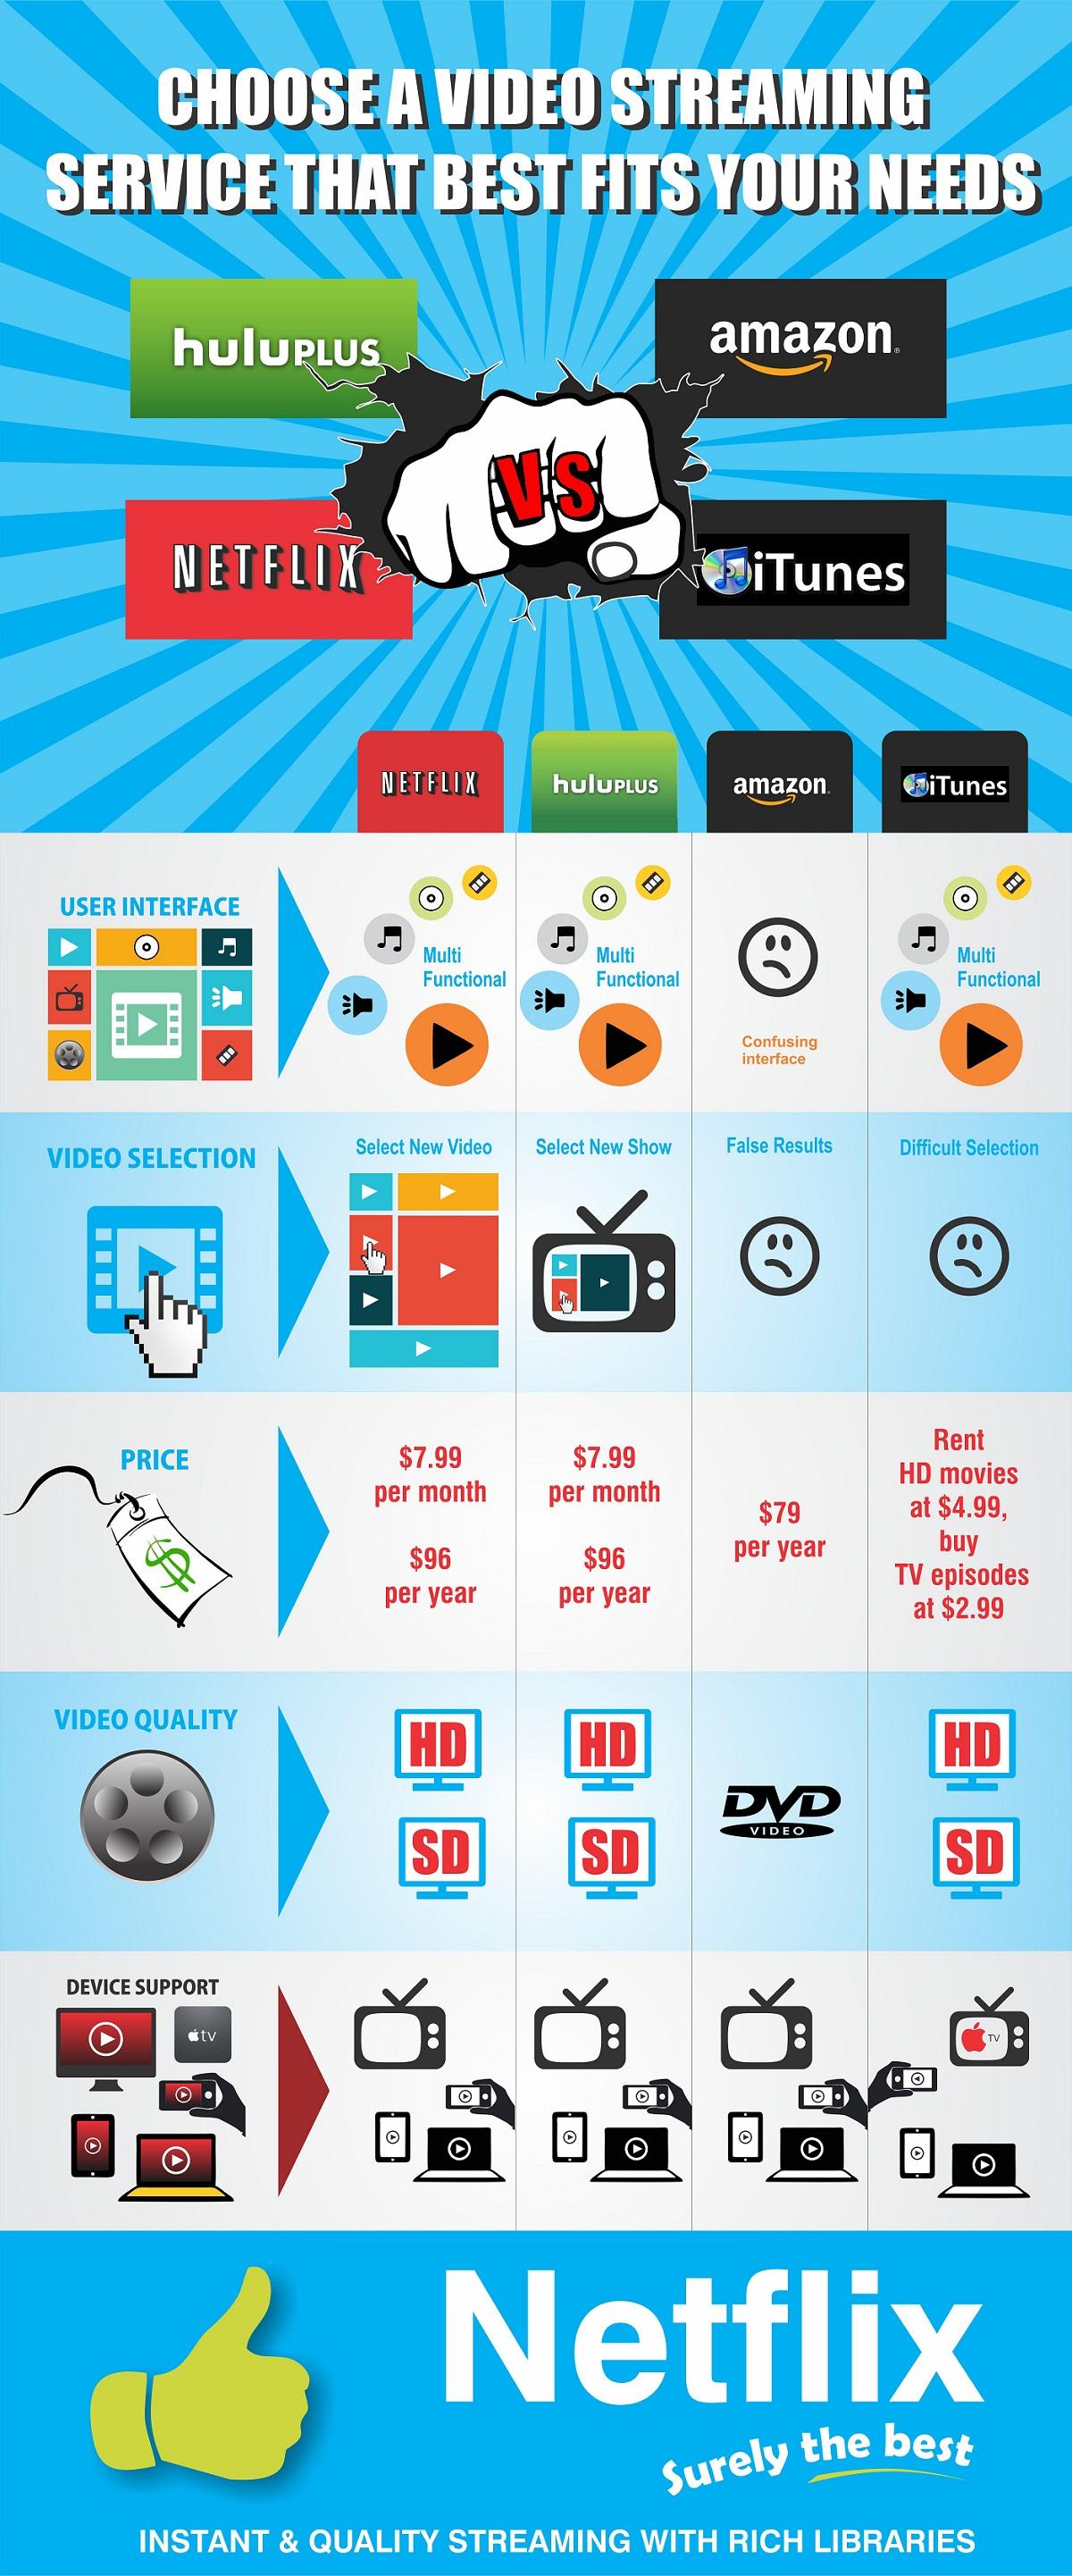 hulu itunes amazon netflix infographic